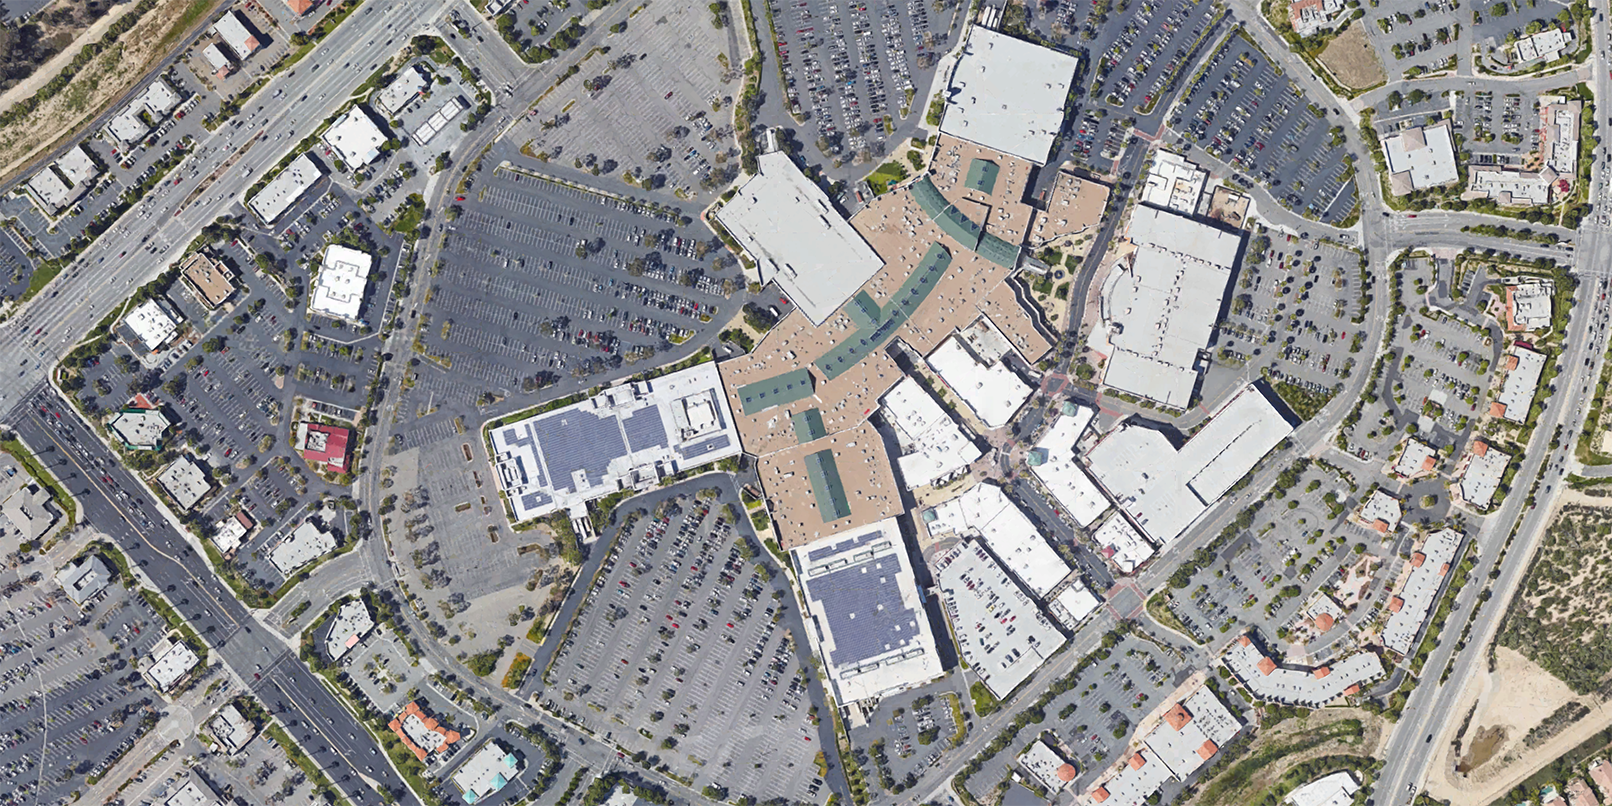 California startup predicts retail failure via satellite images